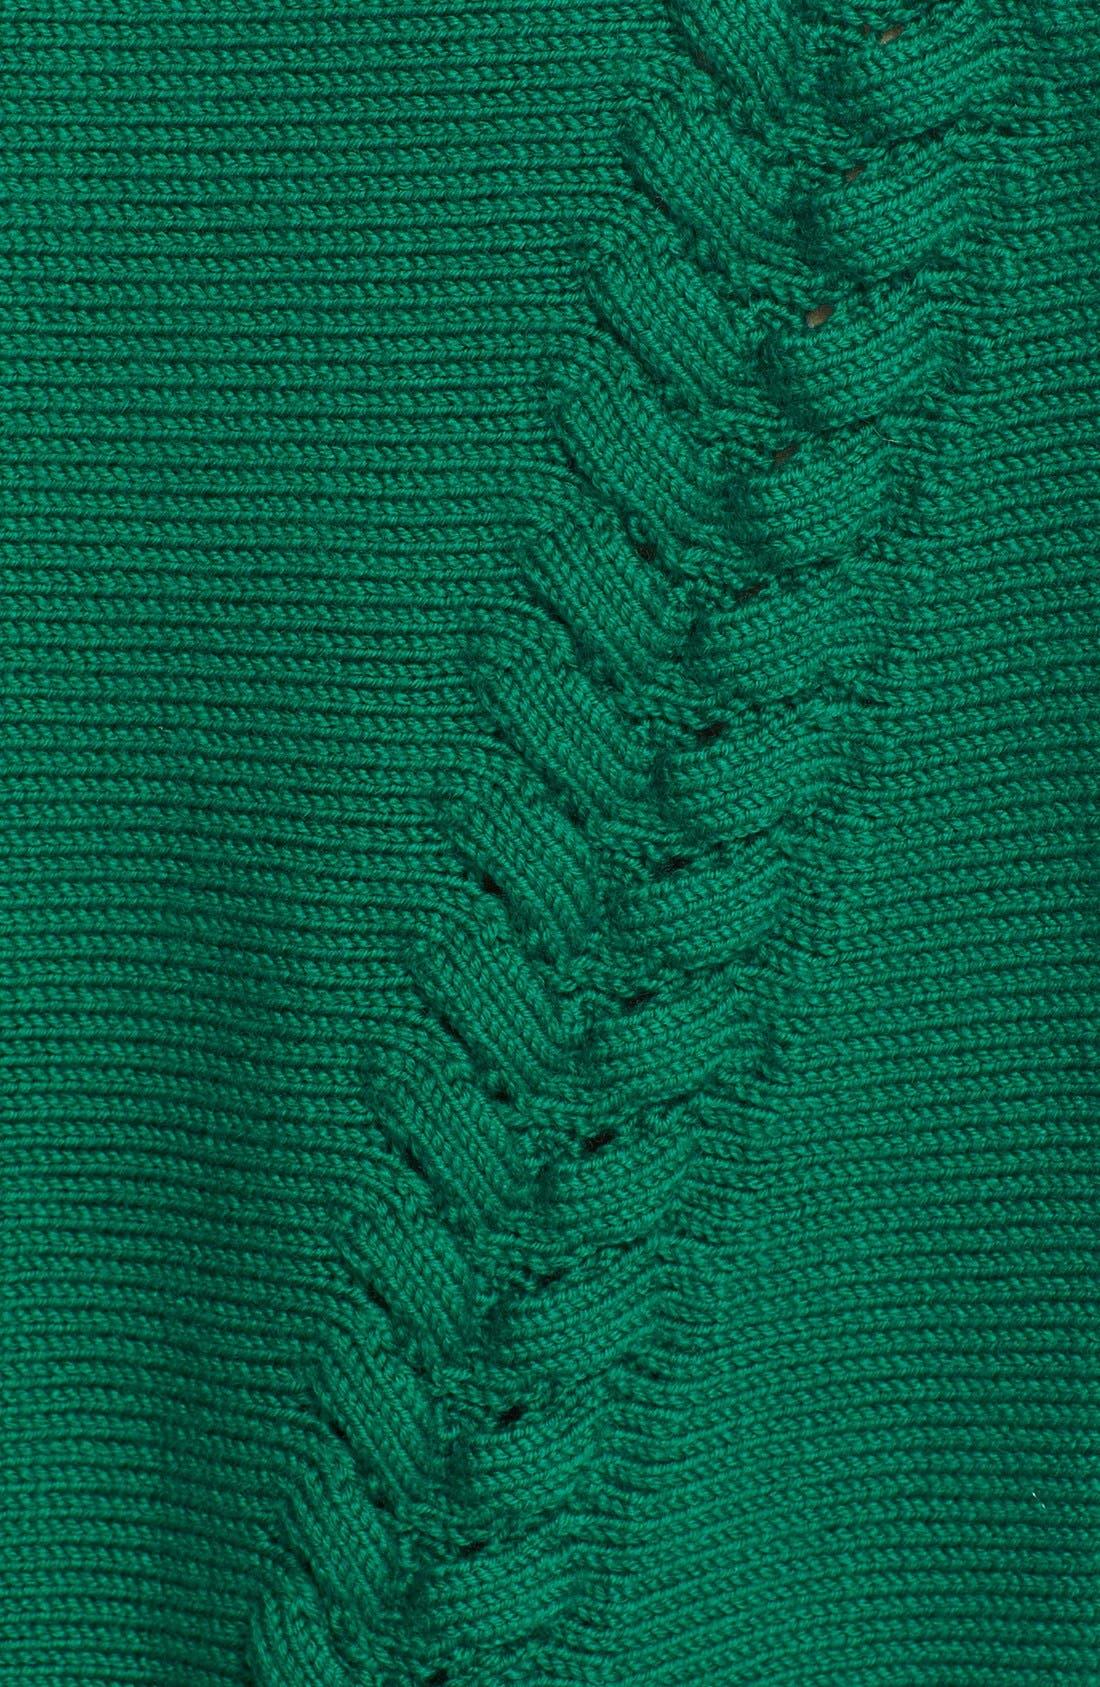 Braid Stitch Wool Crop Sweater,                             Alternate thumbnail 2, color,                             301